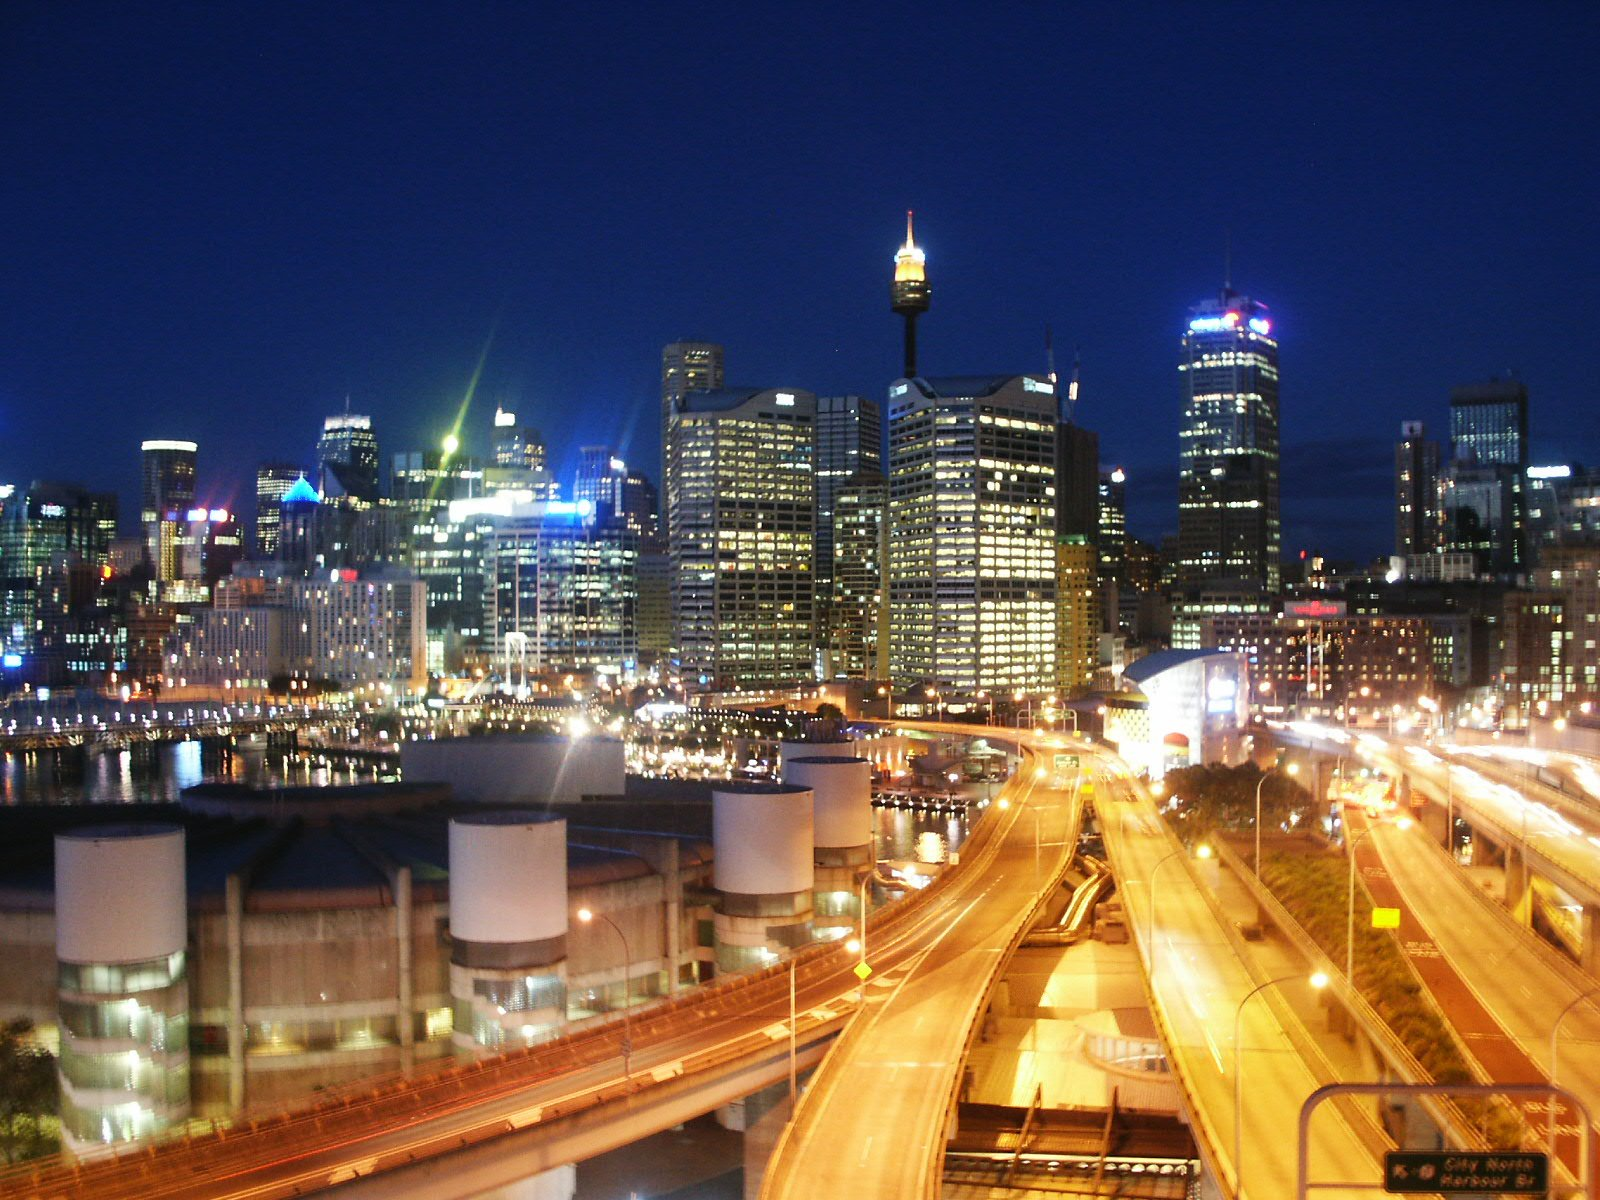 Nighttime Sydney Harbour